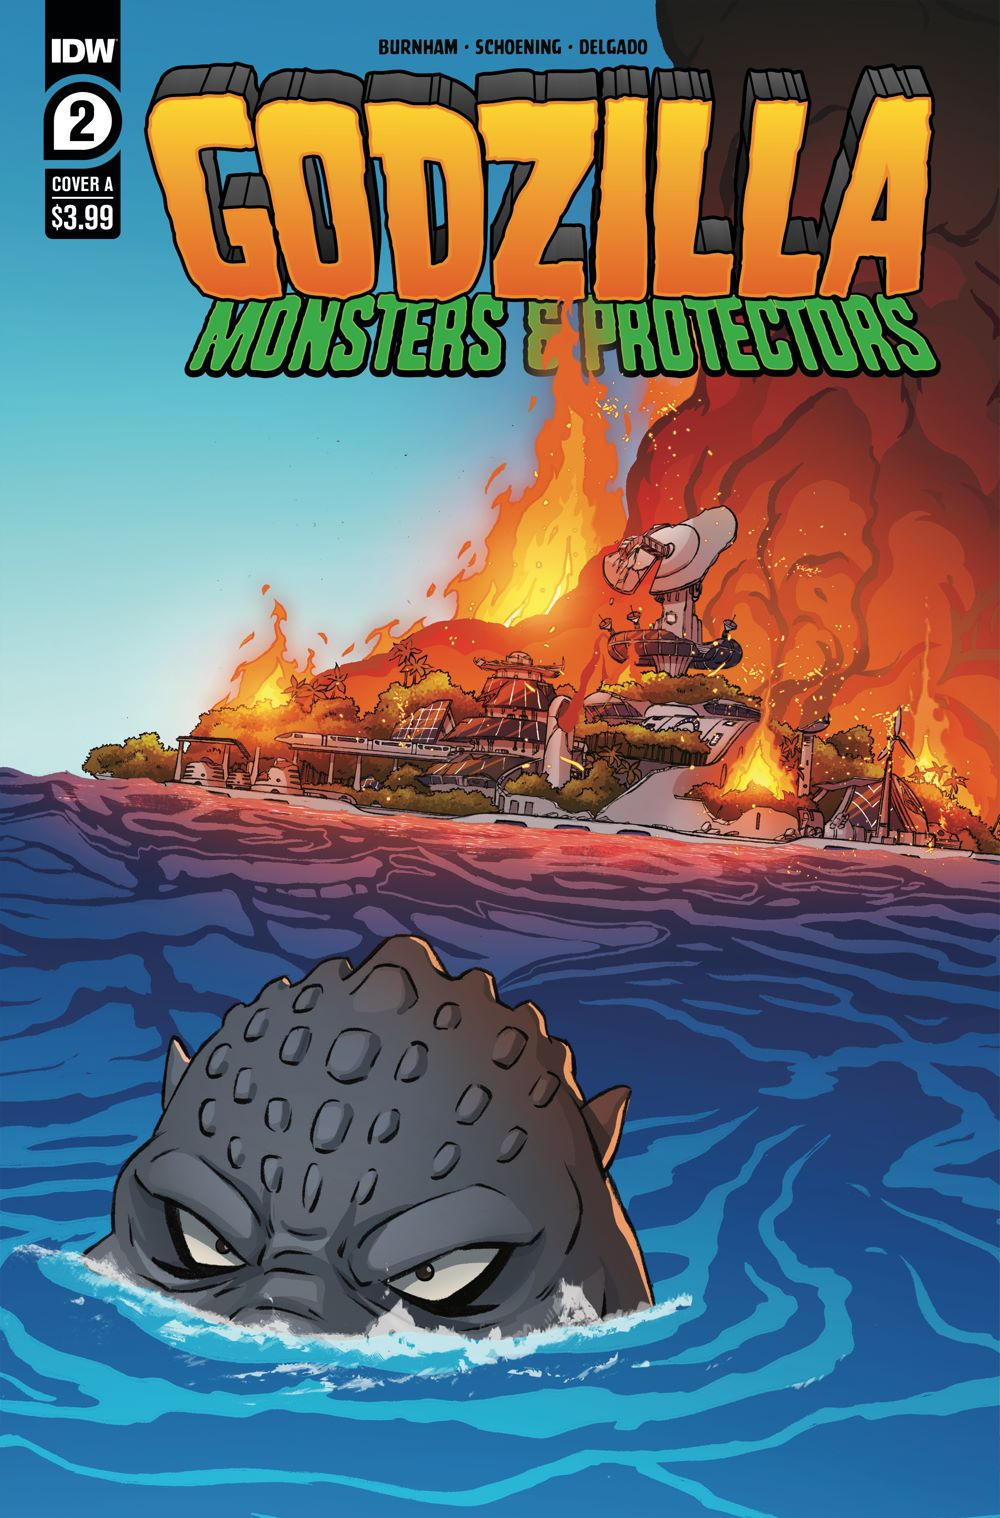 Godzilla_MP02-coverA ComicList: IDW Publishing New Releases for 05/19/2021